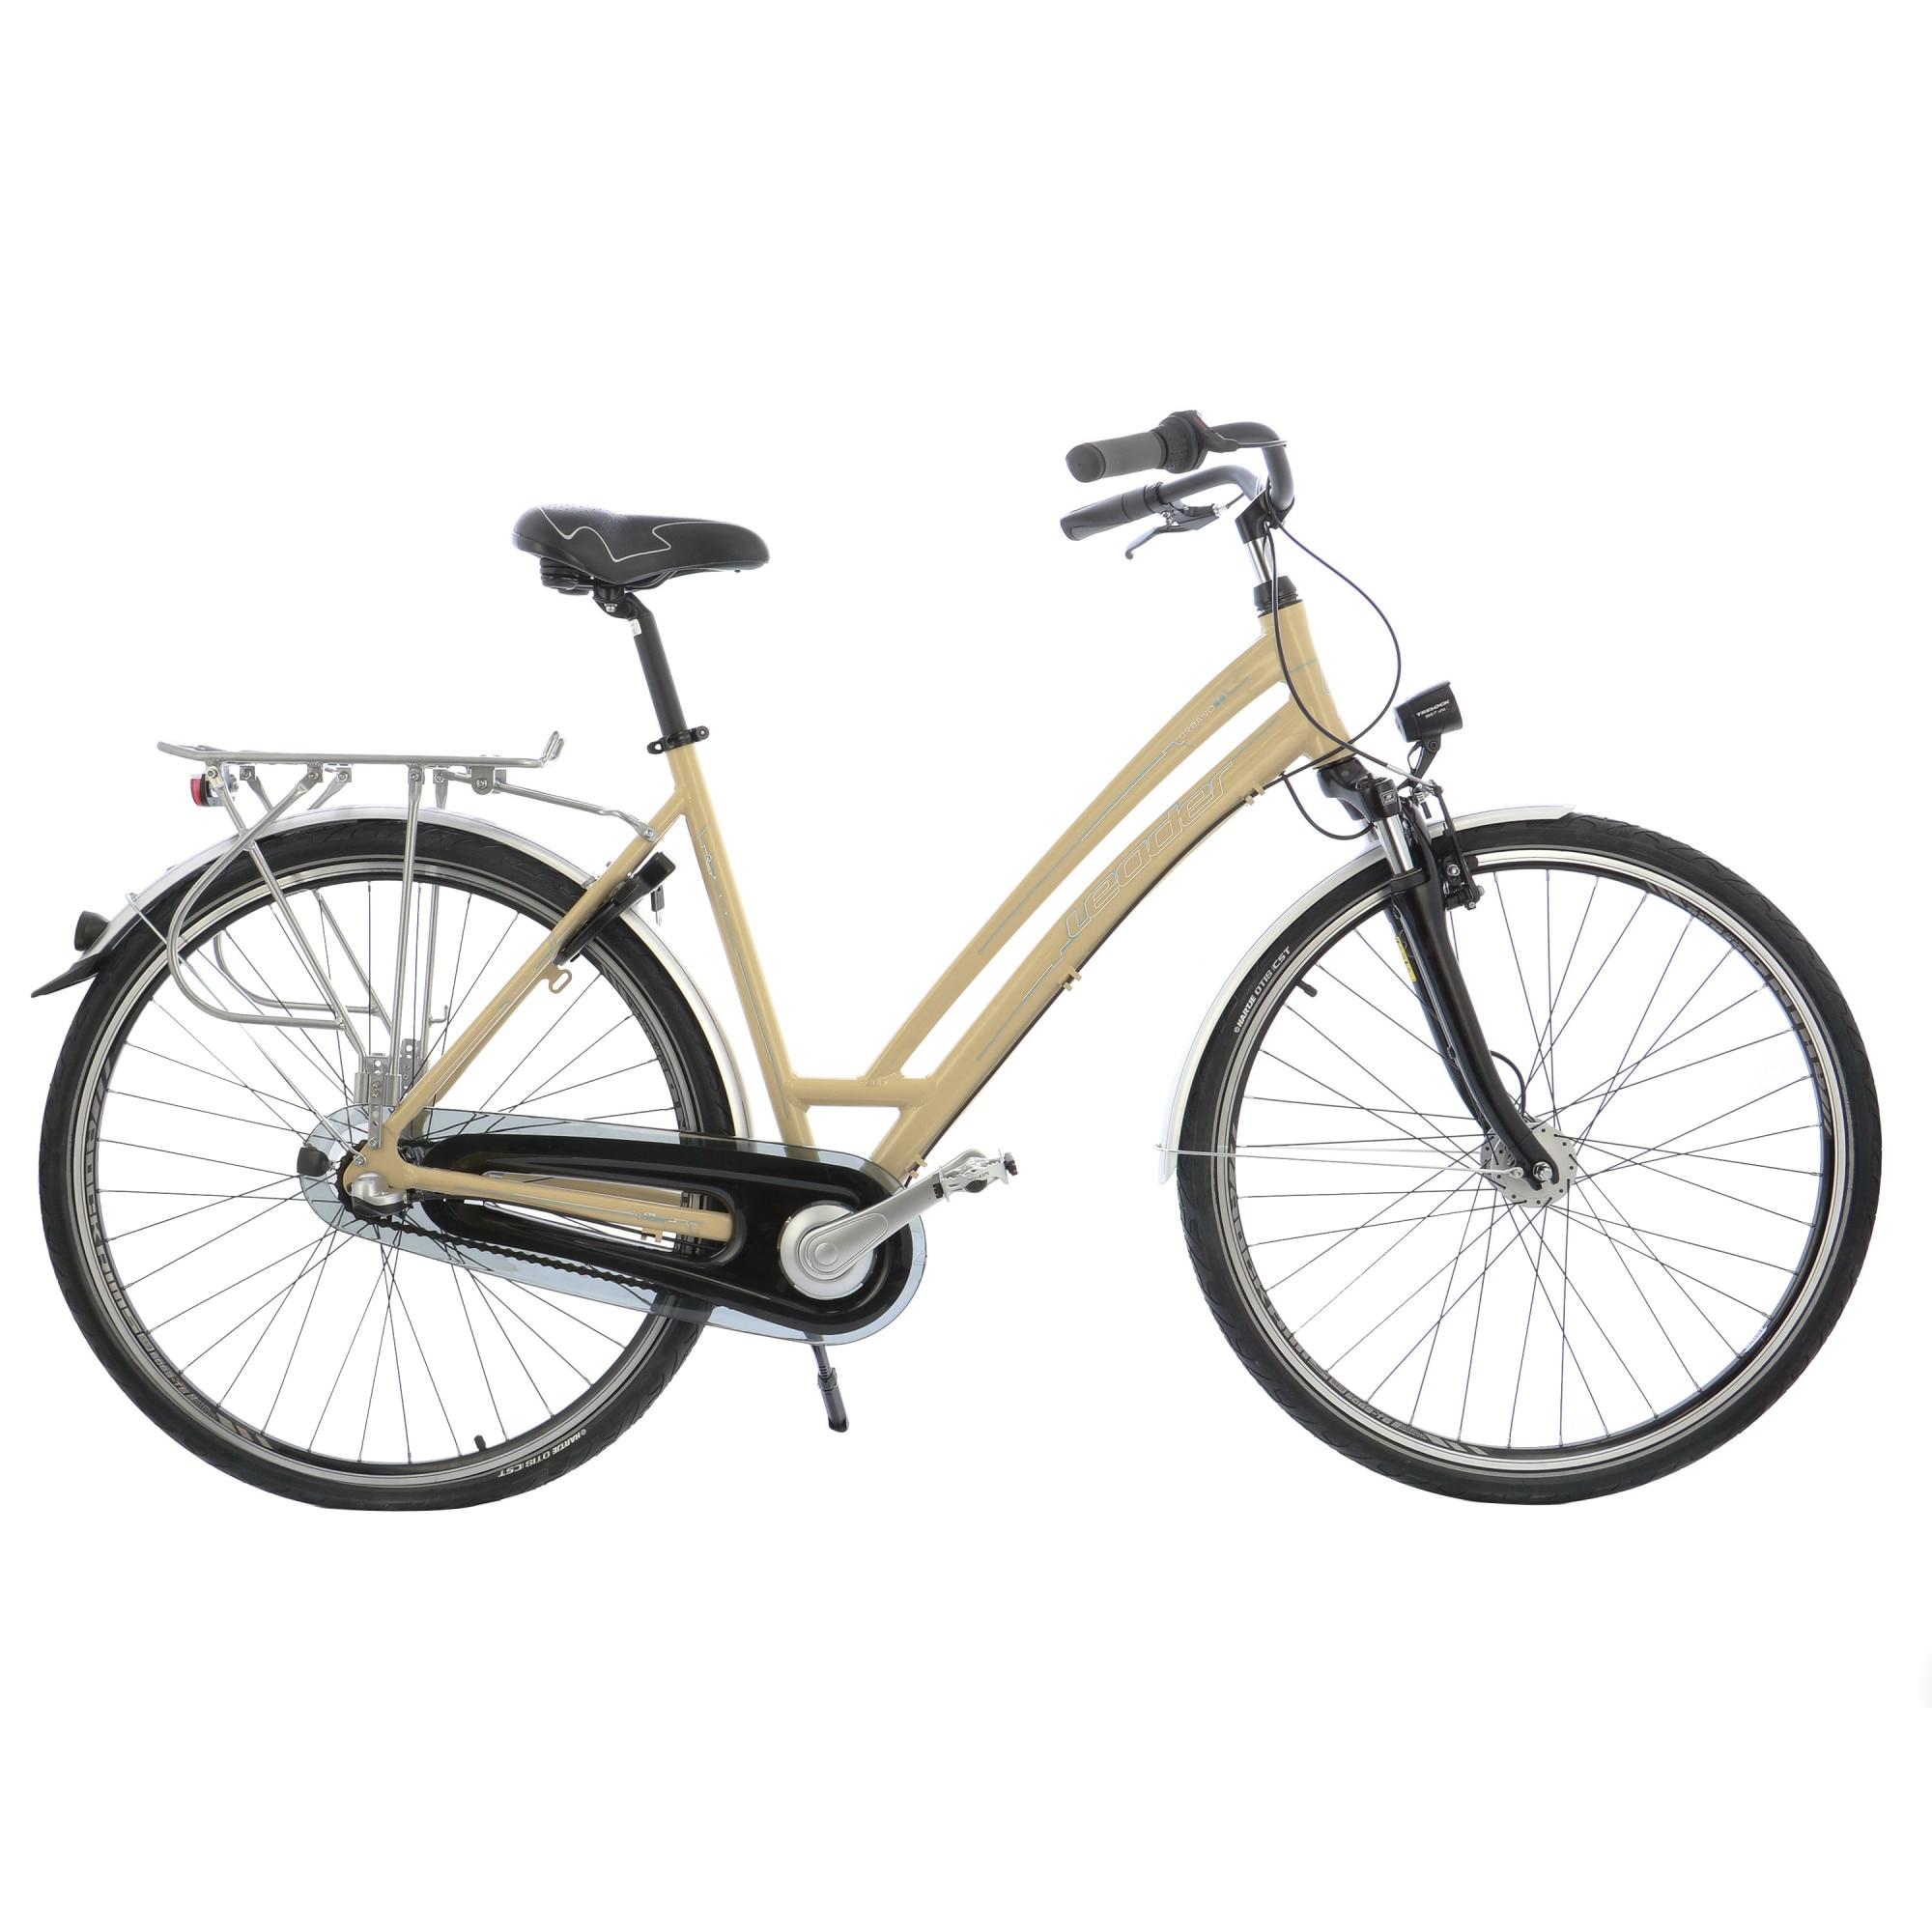 "Fotografie Bicicleta City 28"" Leader Leader W Shimano NX 3v, furca Suntour, cadru AL, 53cm, Beige"